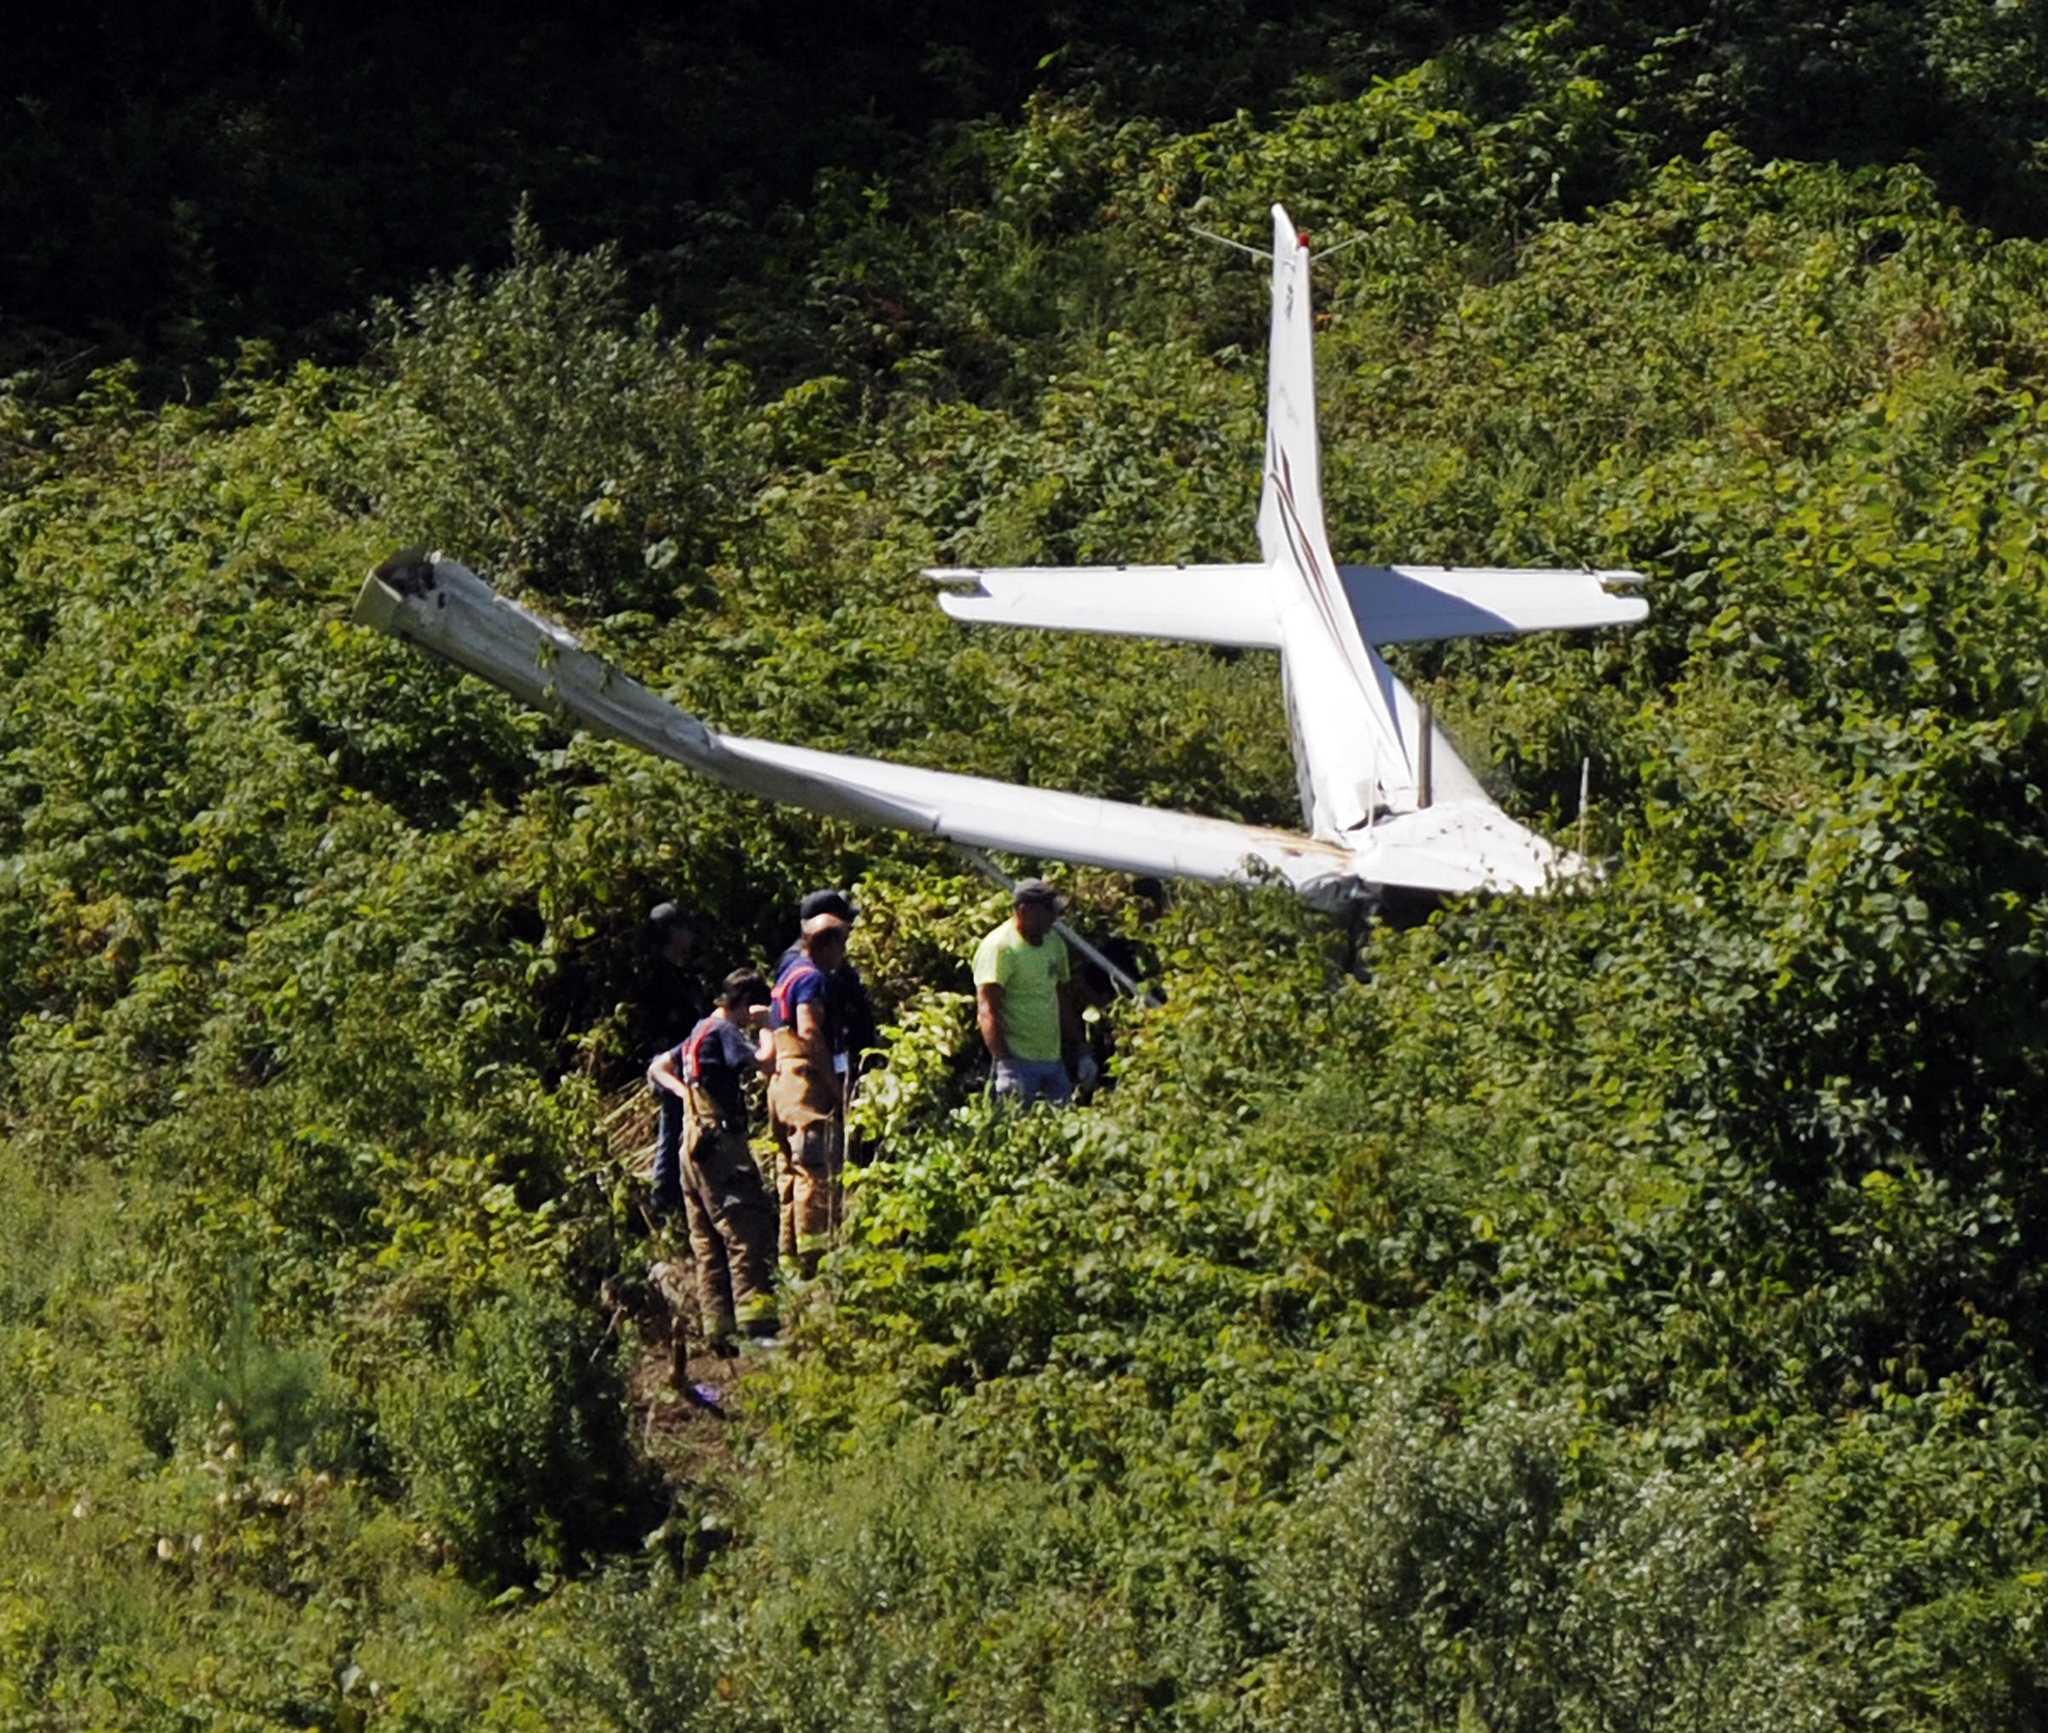 Plane Crashes Near Danbury Airport Sunday Morning